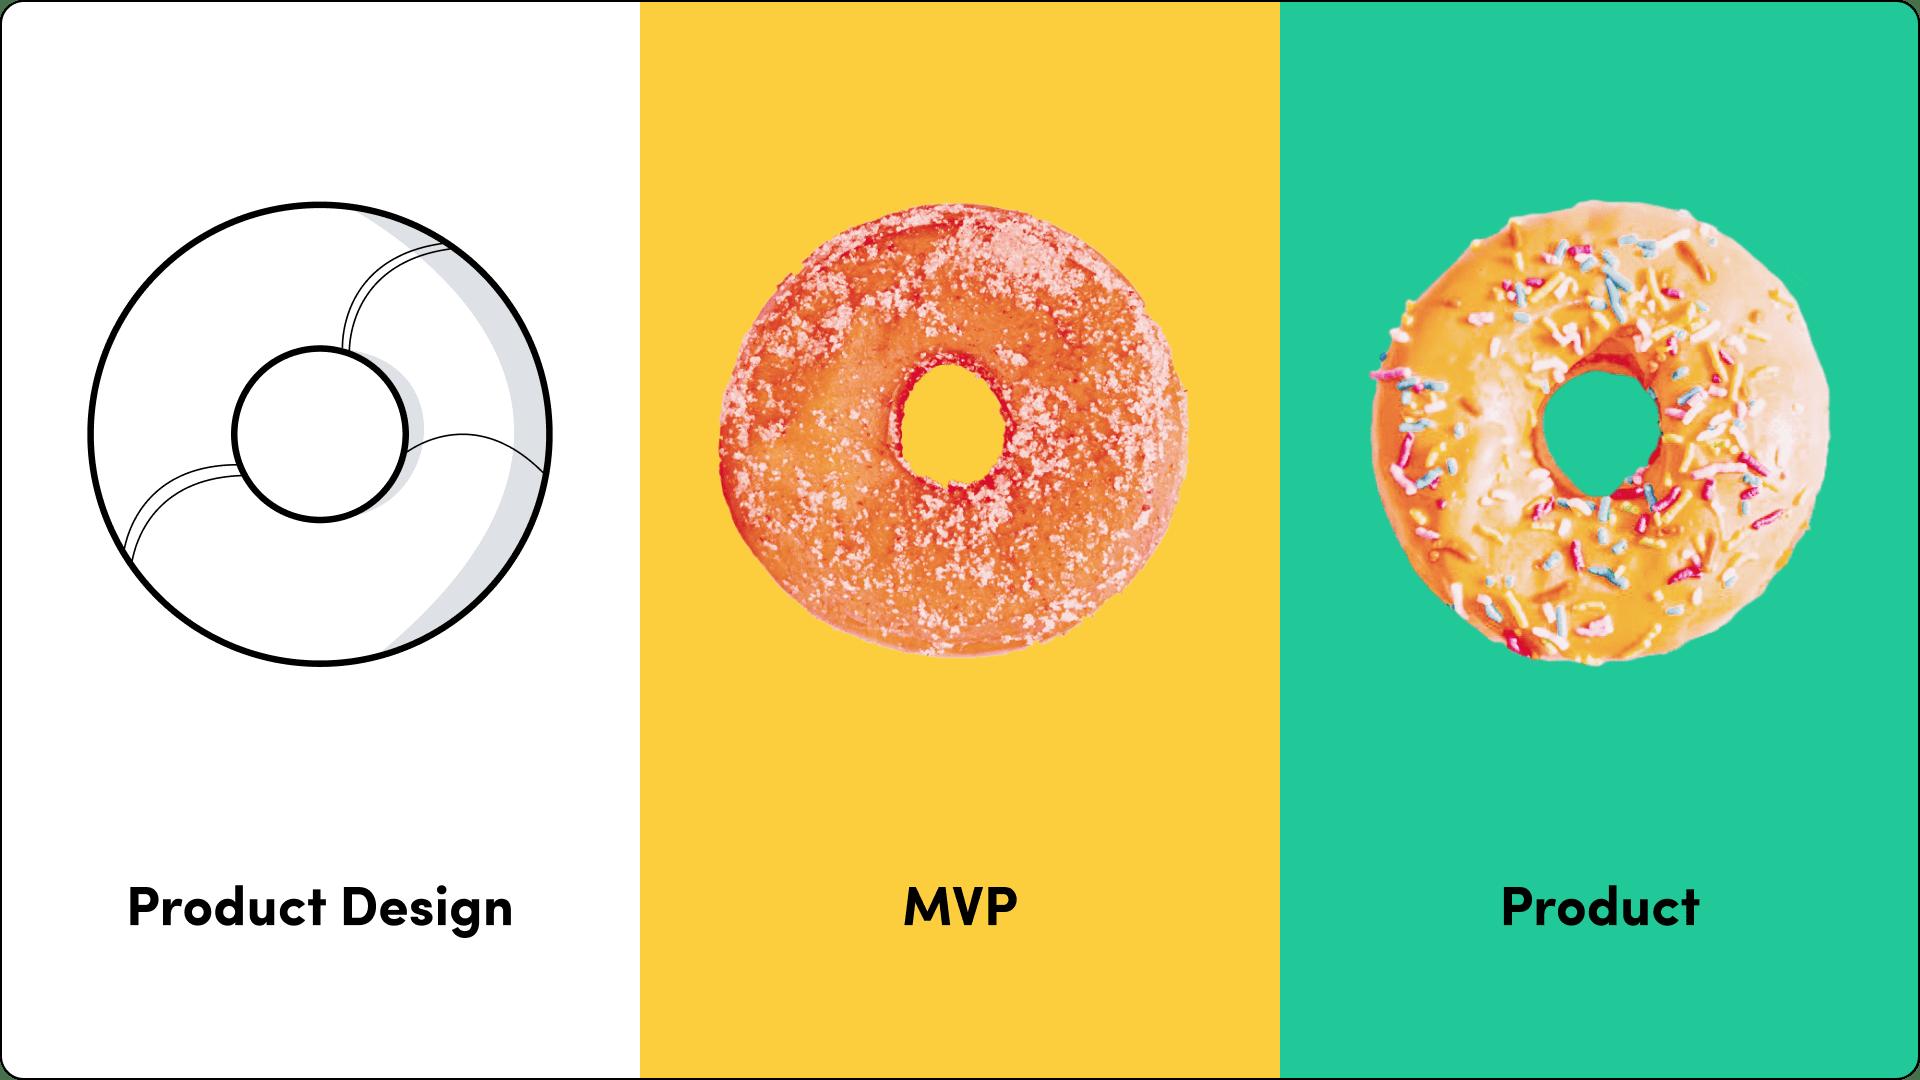 product-design-mvp-minimum-viable-product-example